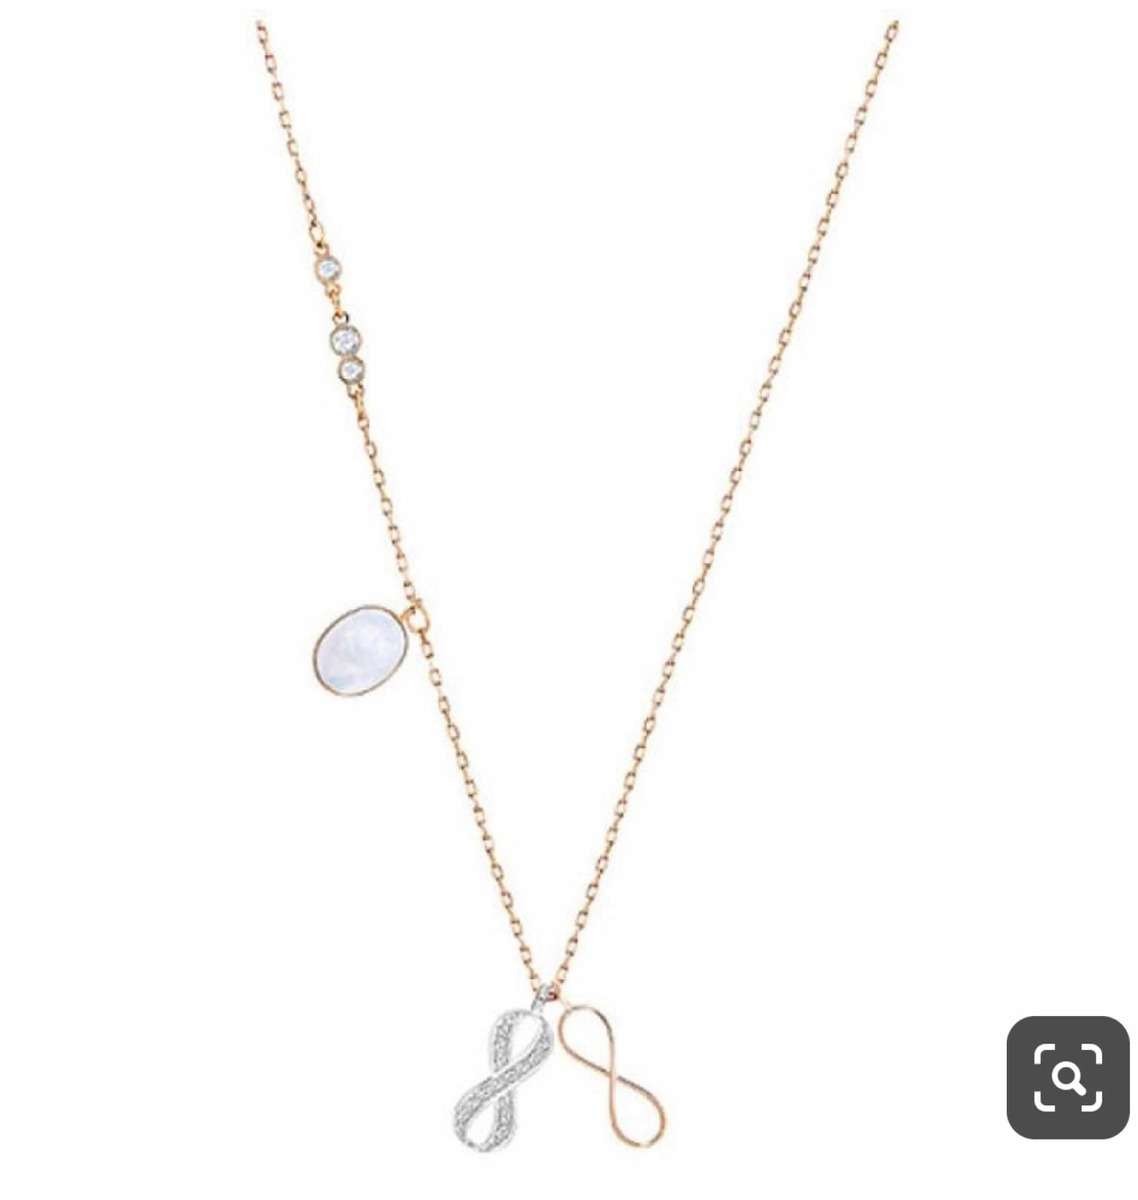 3aca832fcec1 Collar Infinito Infinity Swarovski - $ 1,300.00